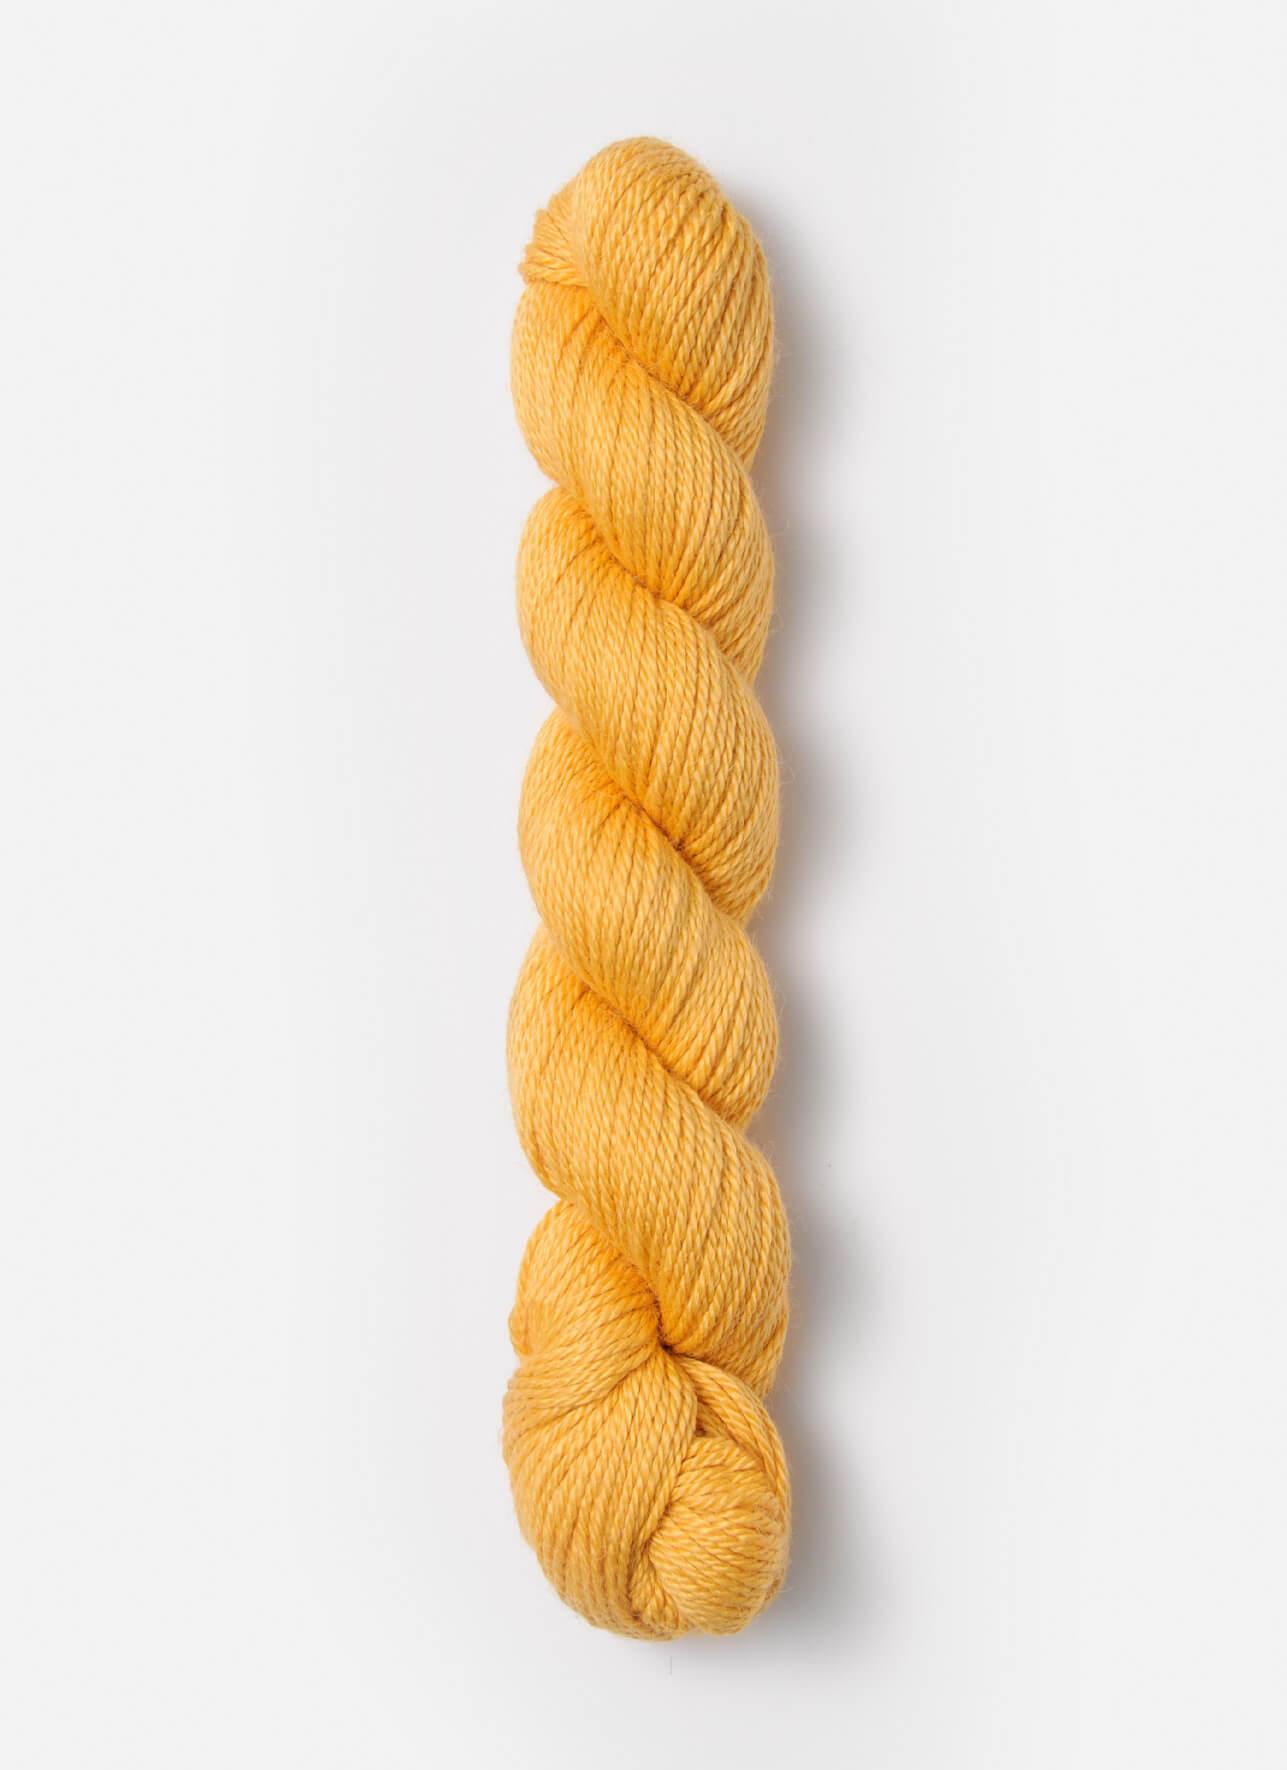 No. 144: Mango